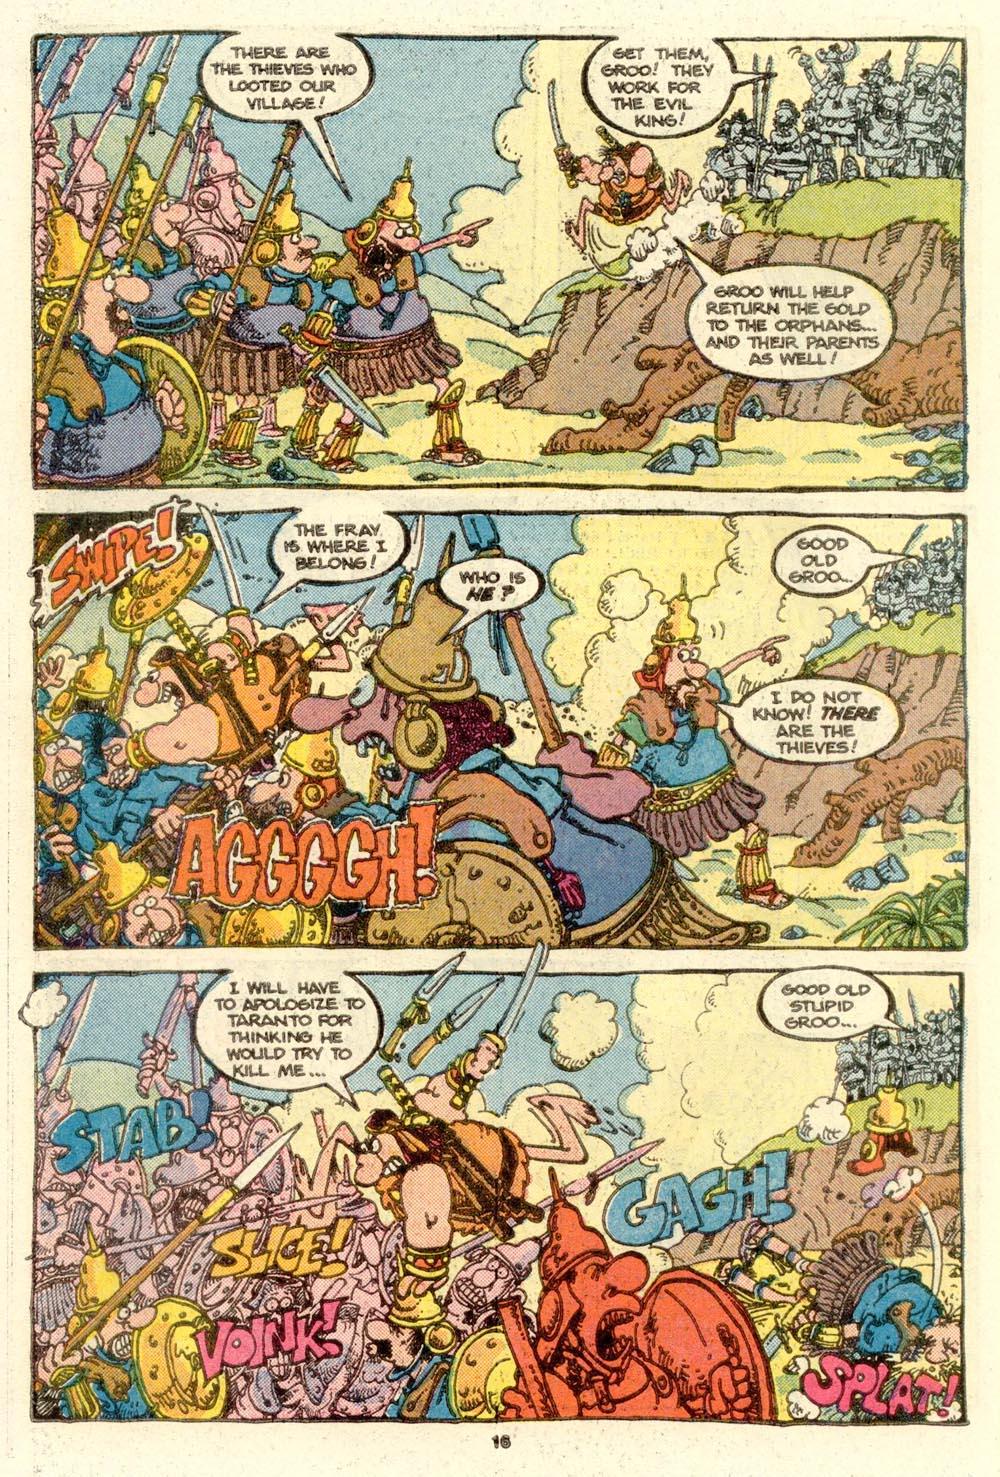 Read online Sergio Aragonés Groo the Wanderer comic -  Issue #16 - 16